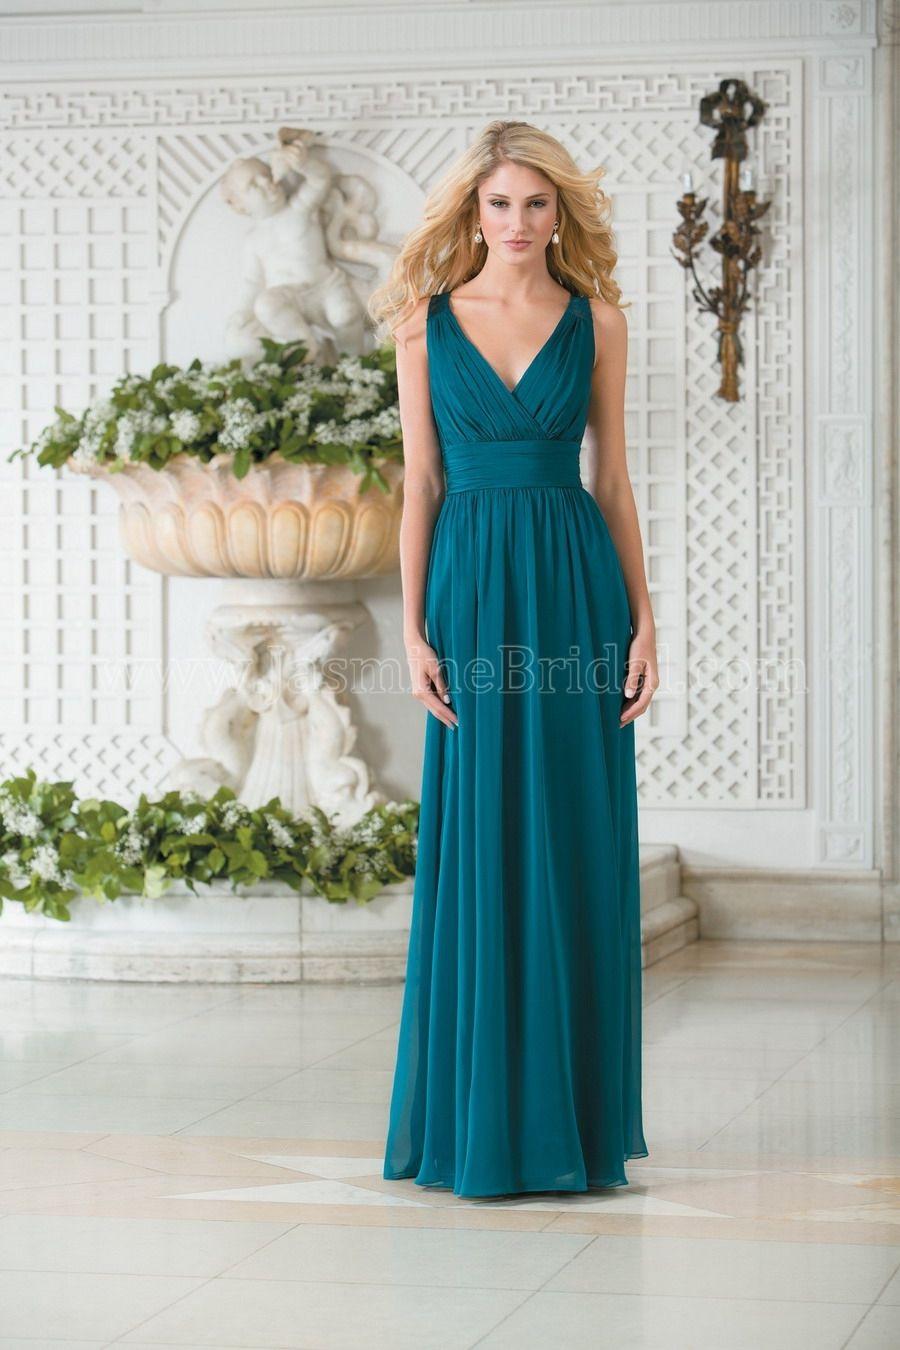 Long Chiffon Bridesmaid Maxi Dress Australia Best in V Neck Lace ...